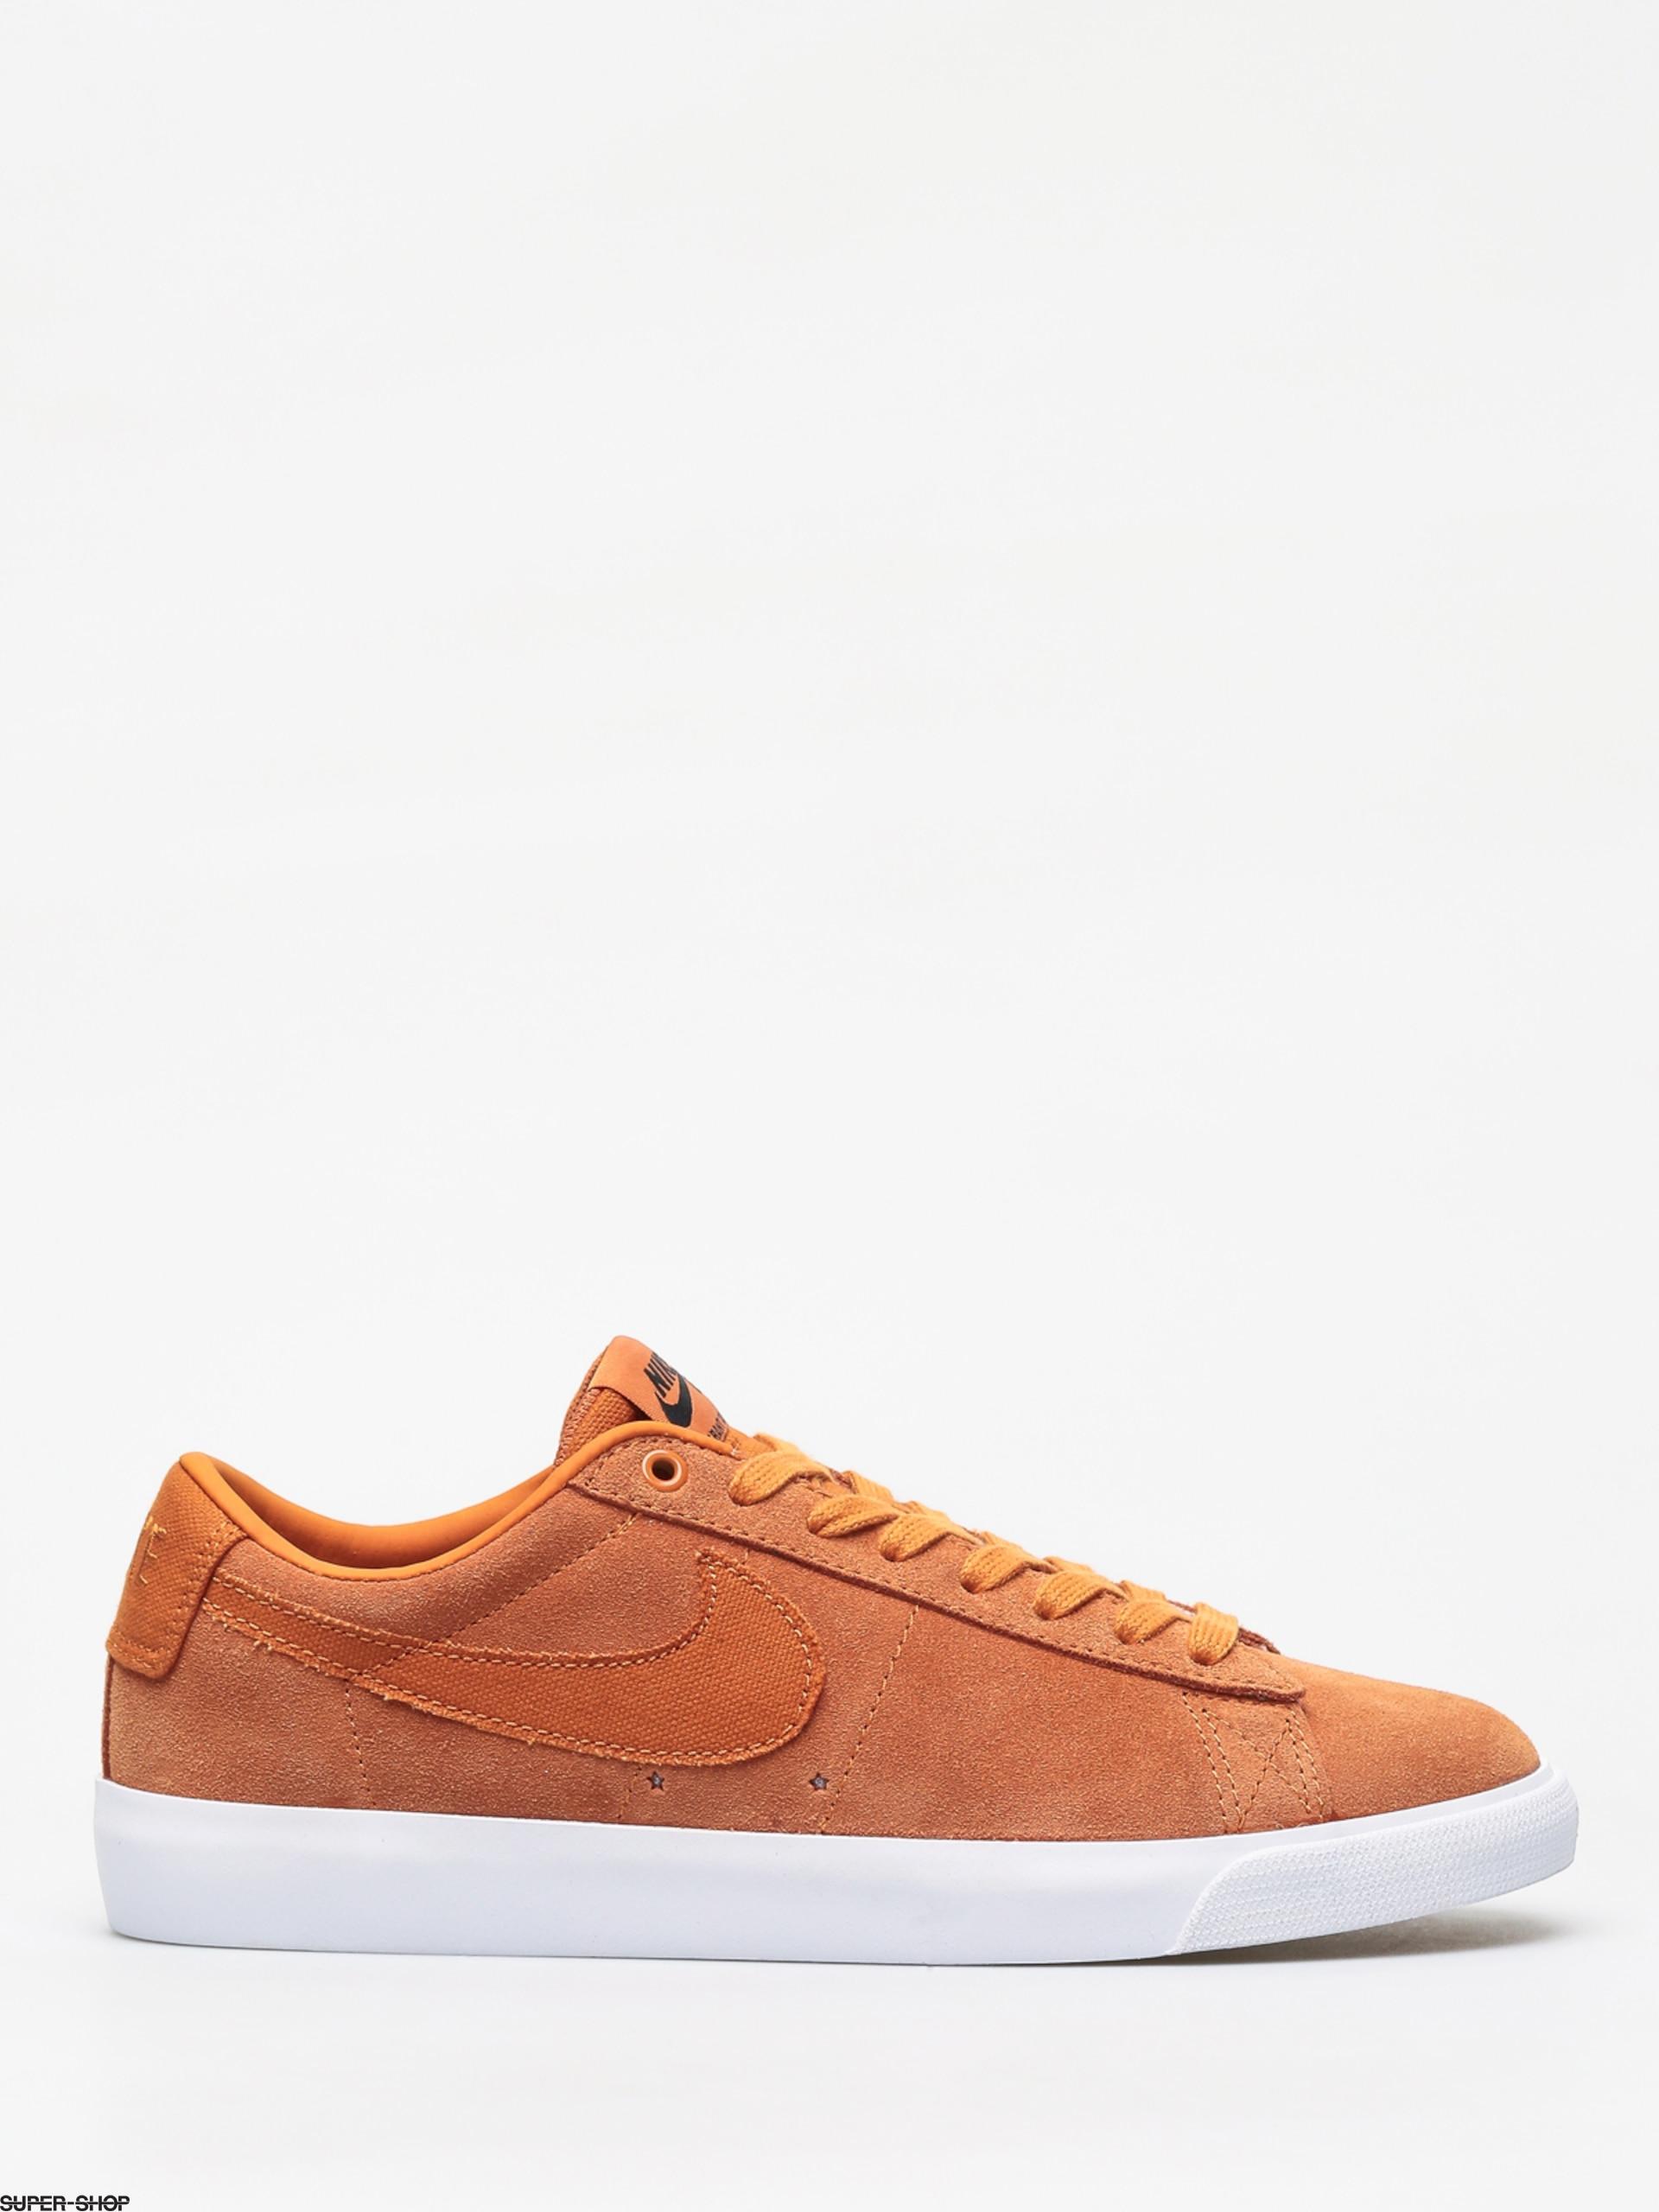 90a40a91b3 Nike SB Blazer Low Gt Shoes (cinder orange cinder orange obsidian)